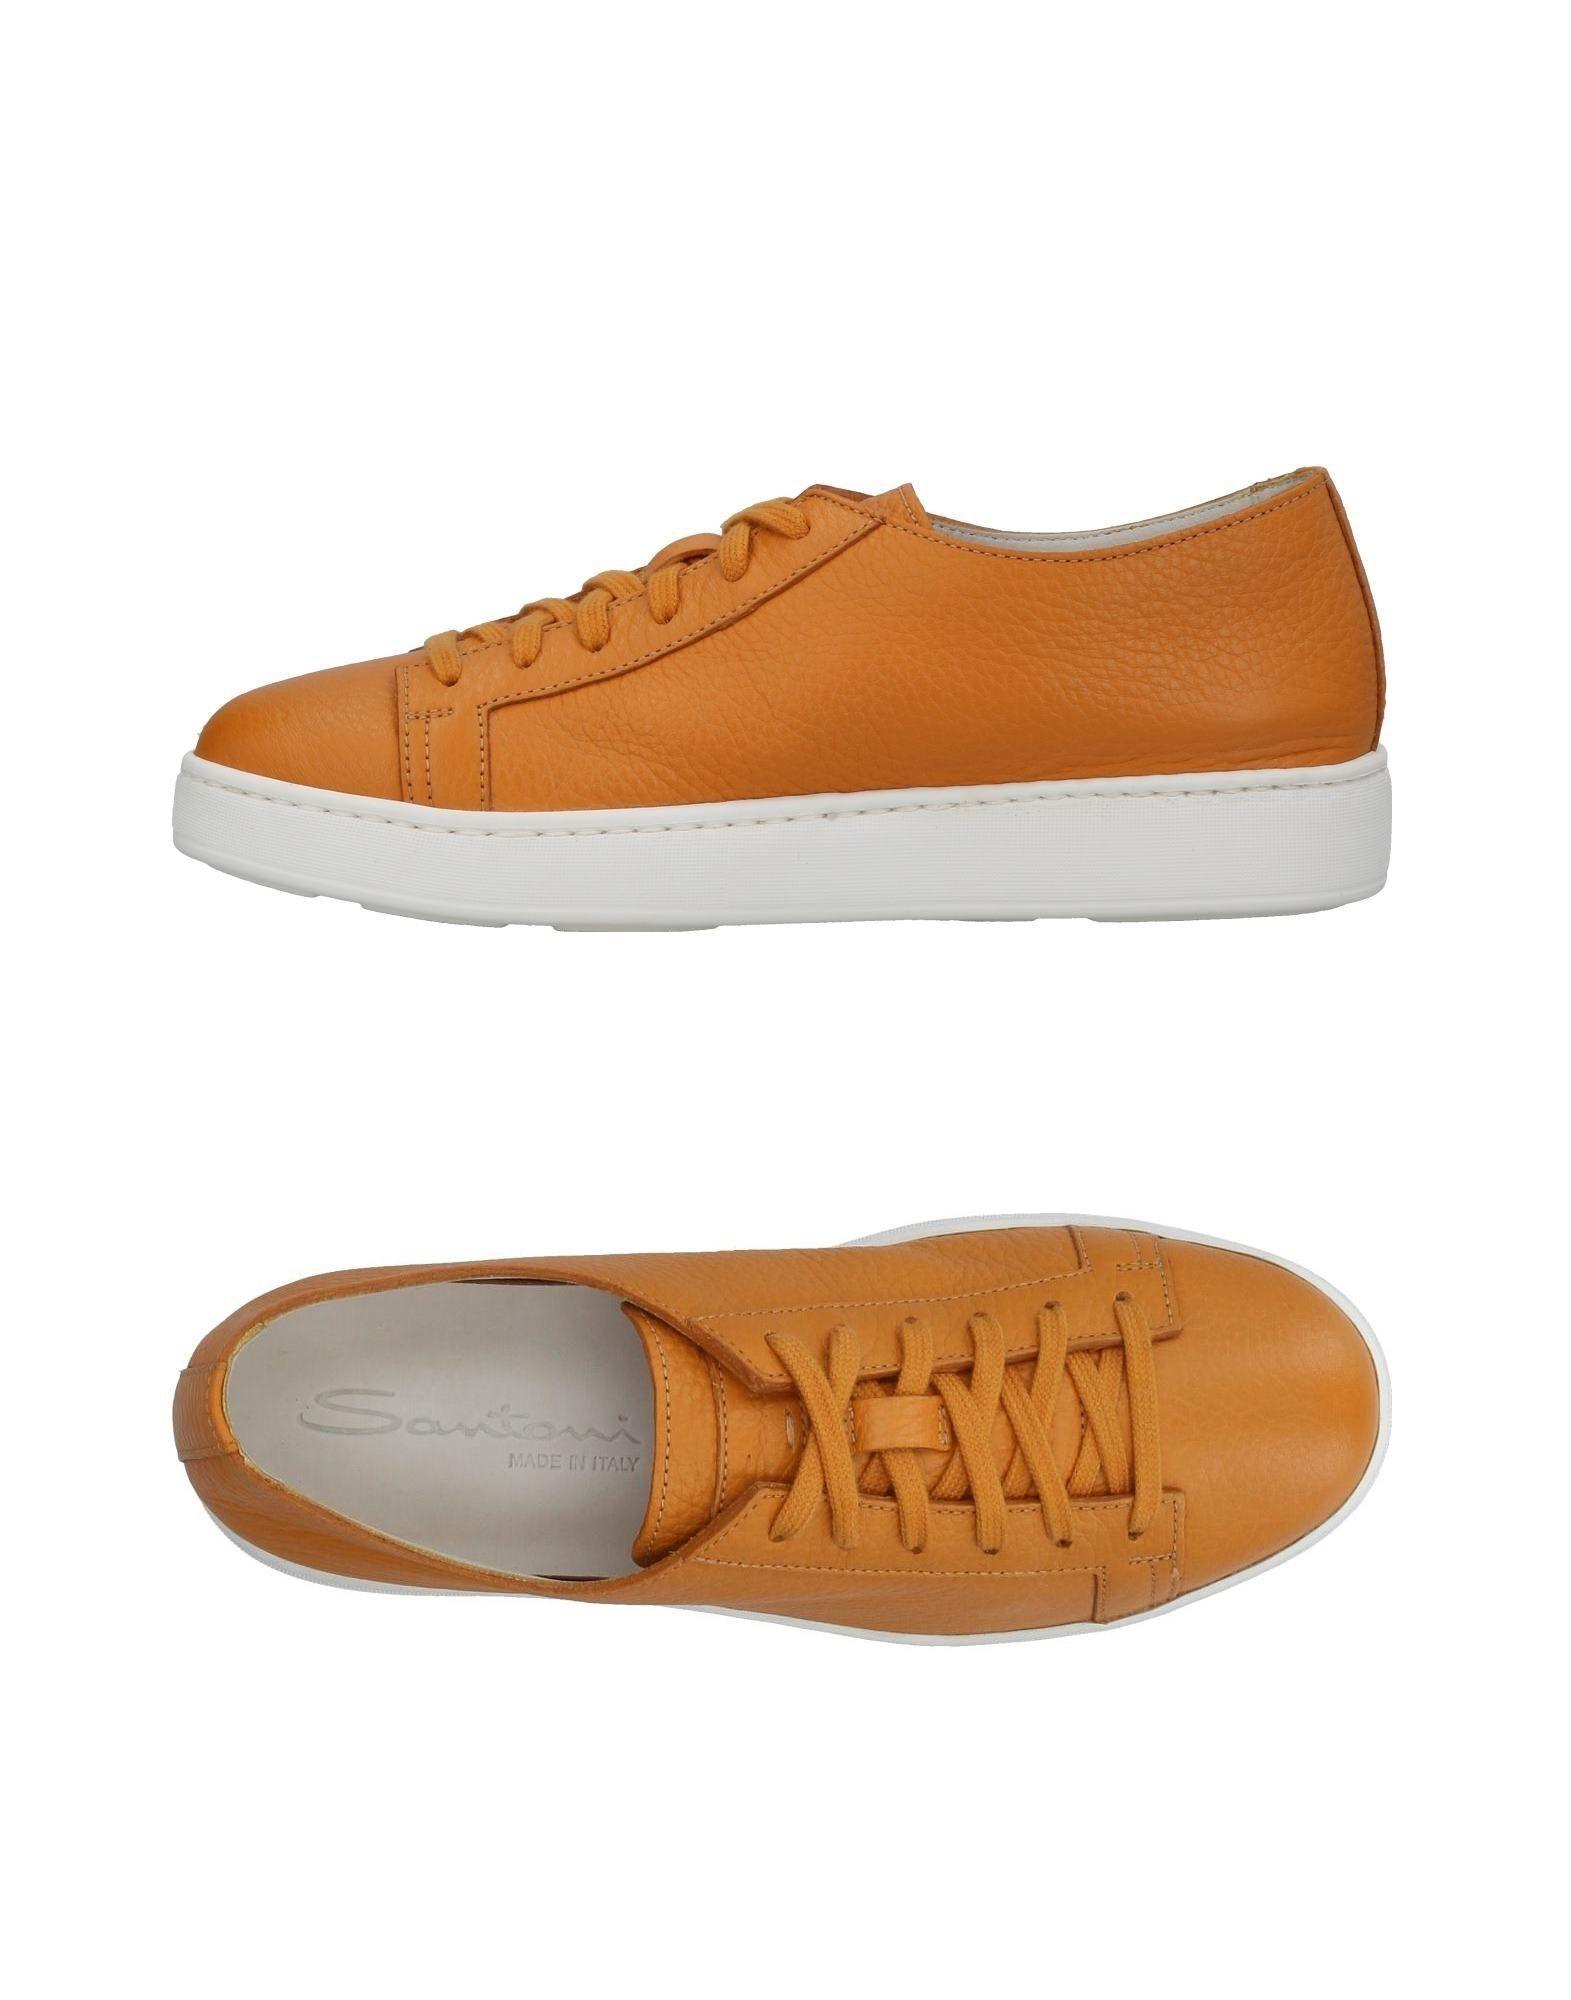 Santoni Sneakers Damen  11387312PQGut aussehende strapazierfähige Schuhe